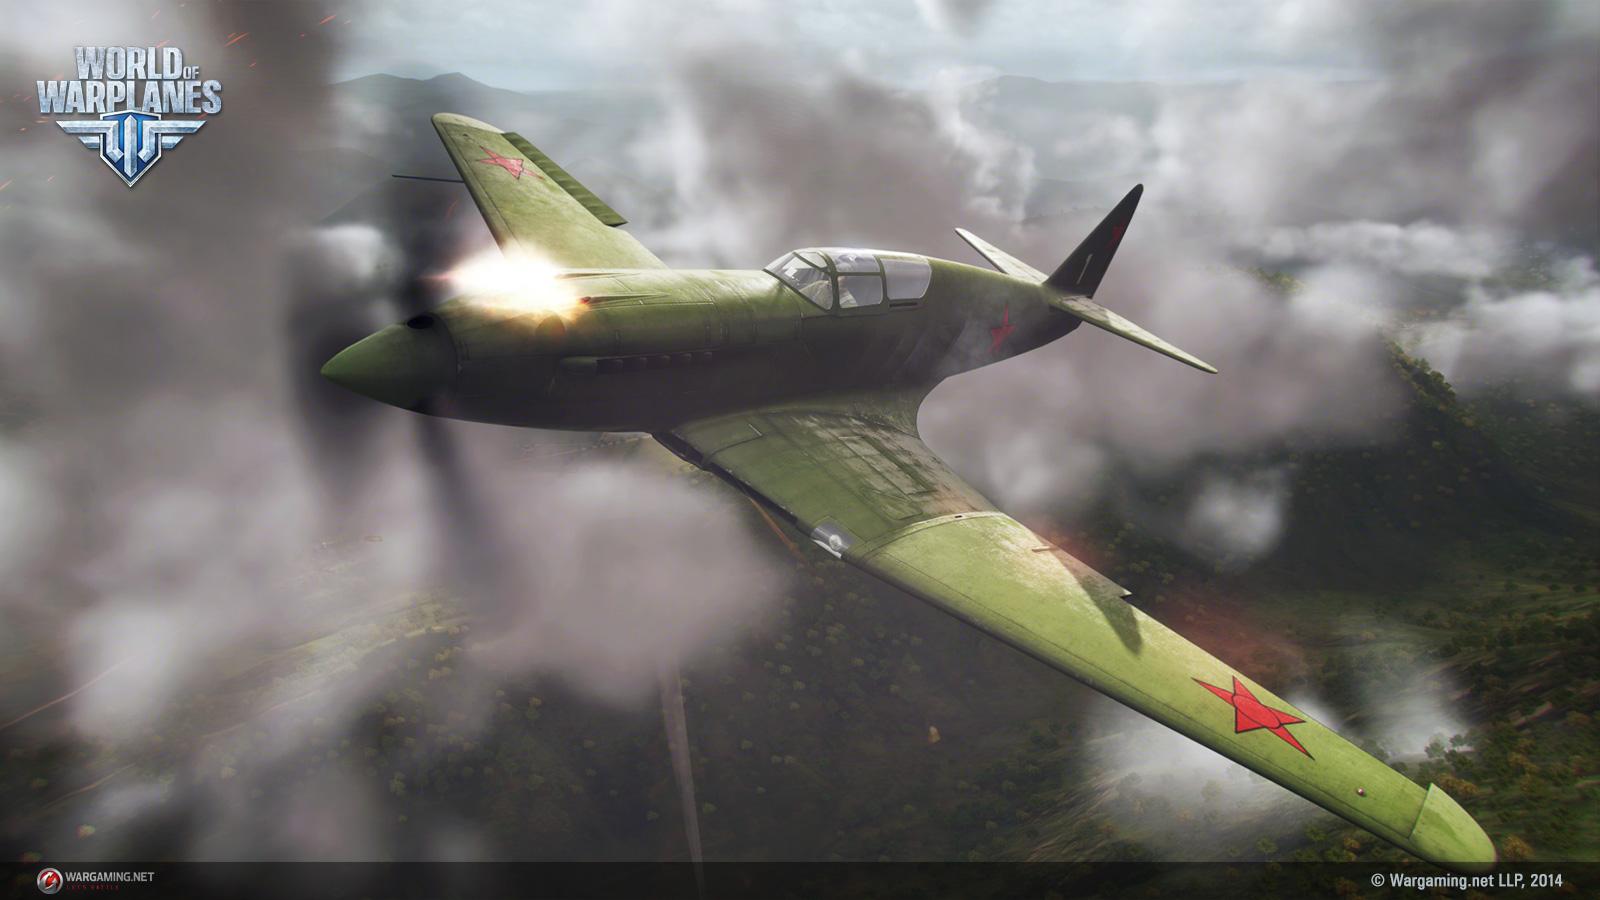 WoWP_Screens_Warplanes_USSR_I_220_Image_04